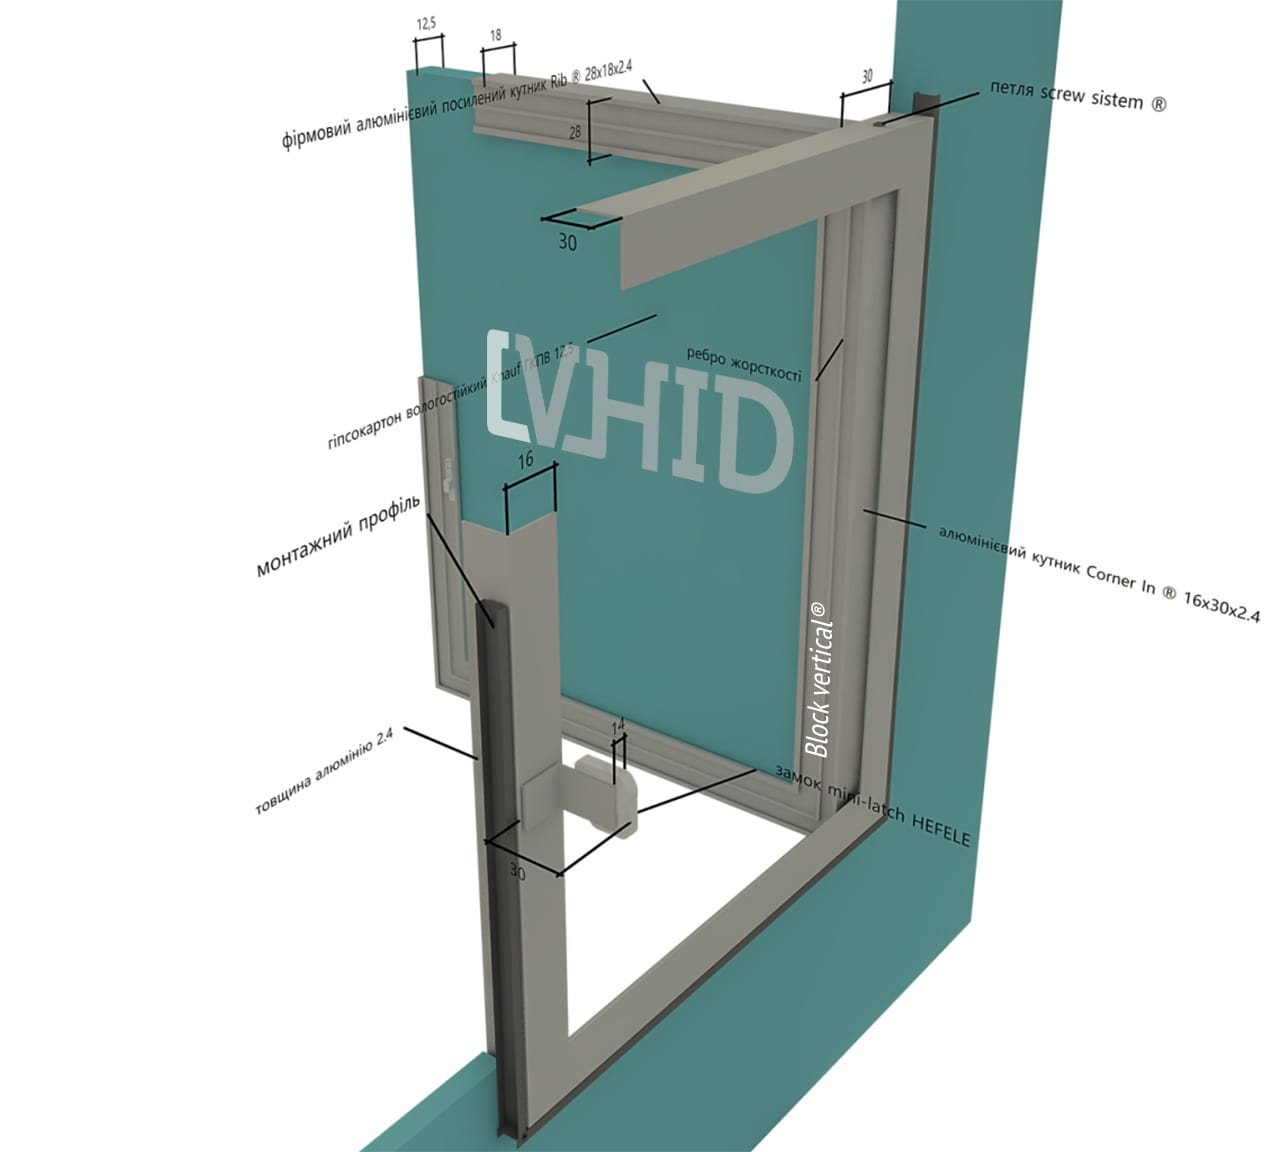 Bloc-vertical-vhid-3D-drawing